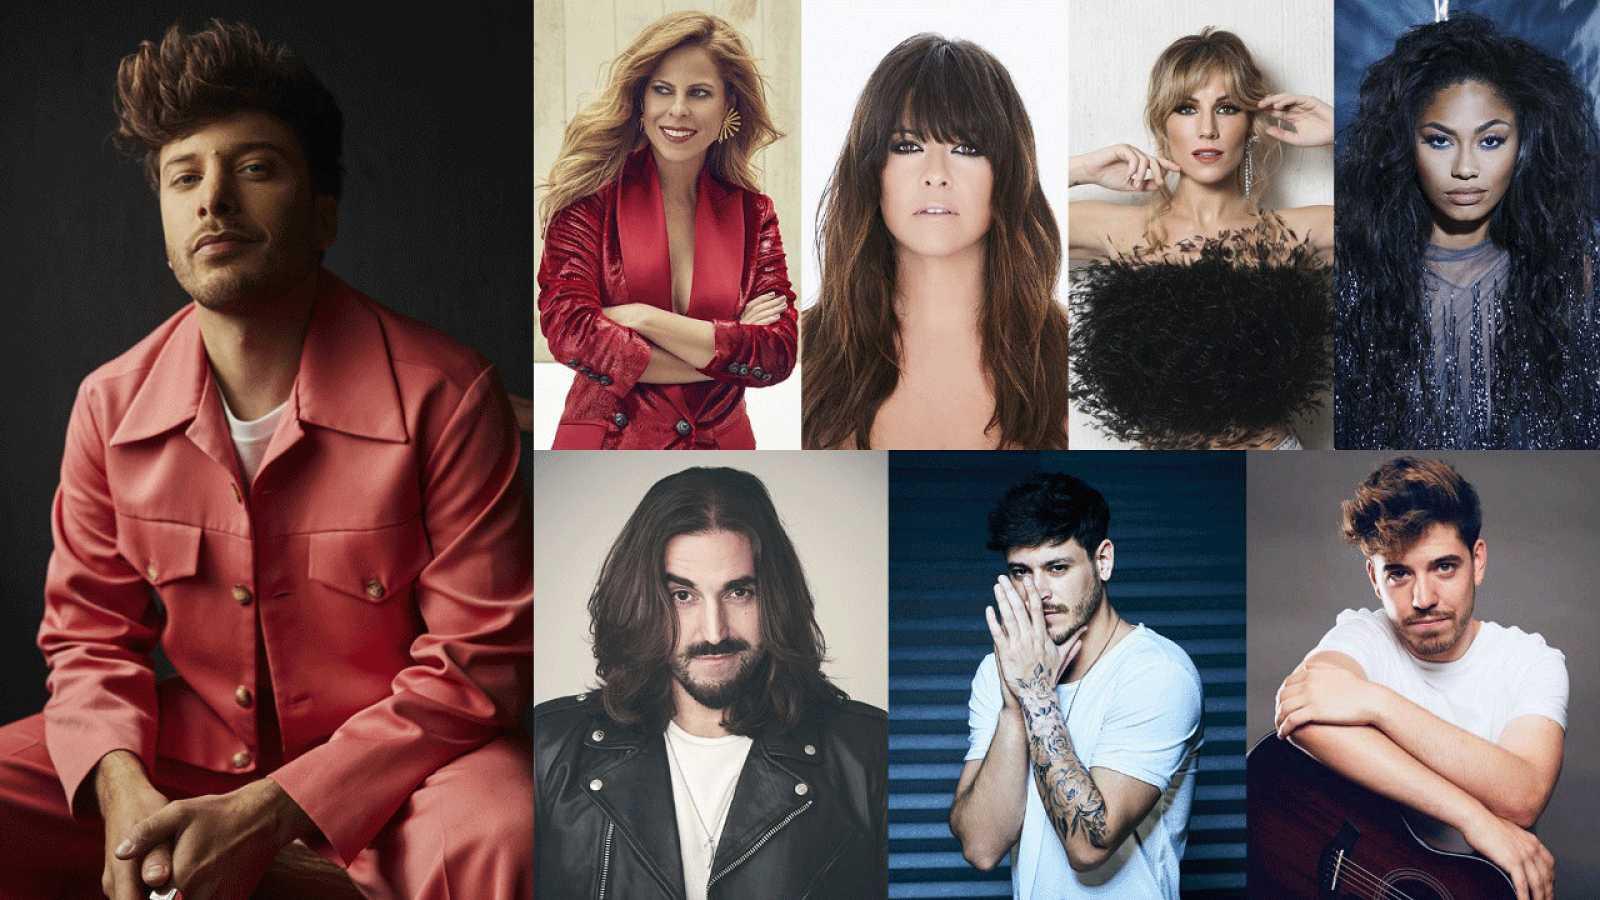 Siete grandes artistas y amigos de Blas Cantó actuarán con él en 'Destino Eurovisión'.